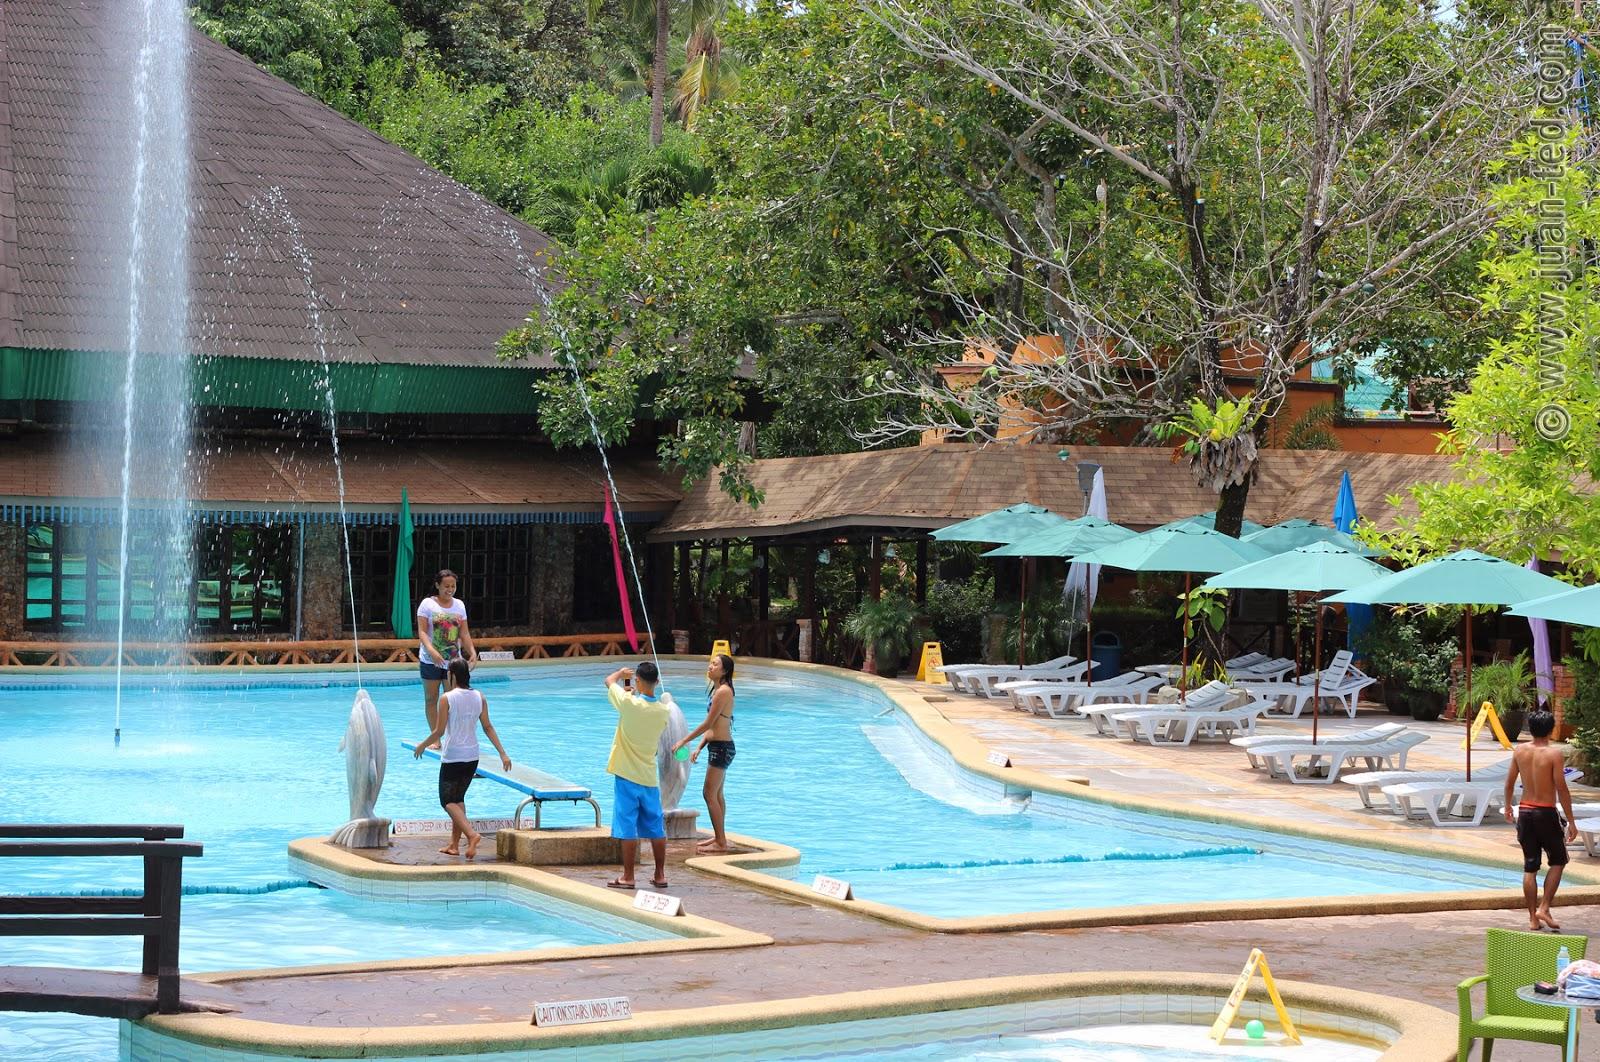 Swimming Pools At Dakak Park Beach Resort Brgy Taguilon Dapitan City Province Of Zamboanga